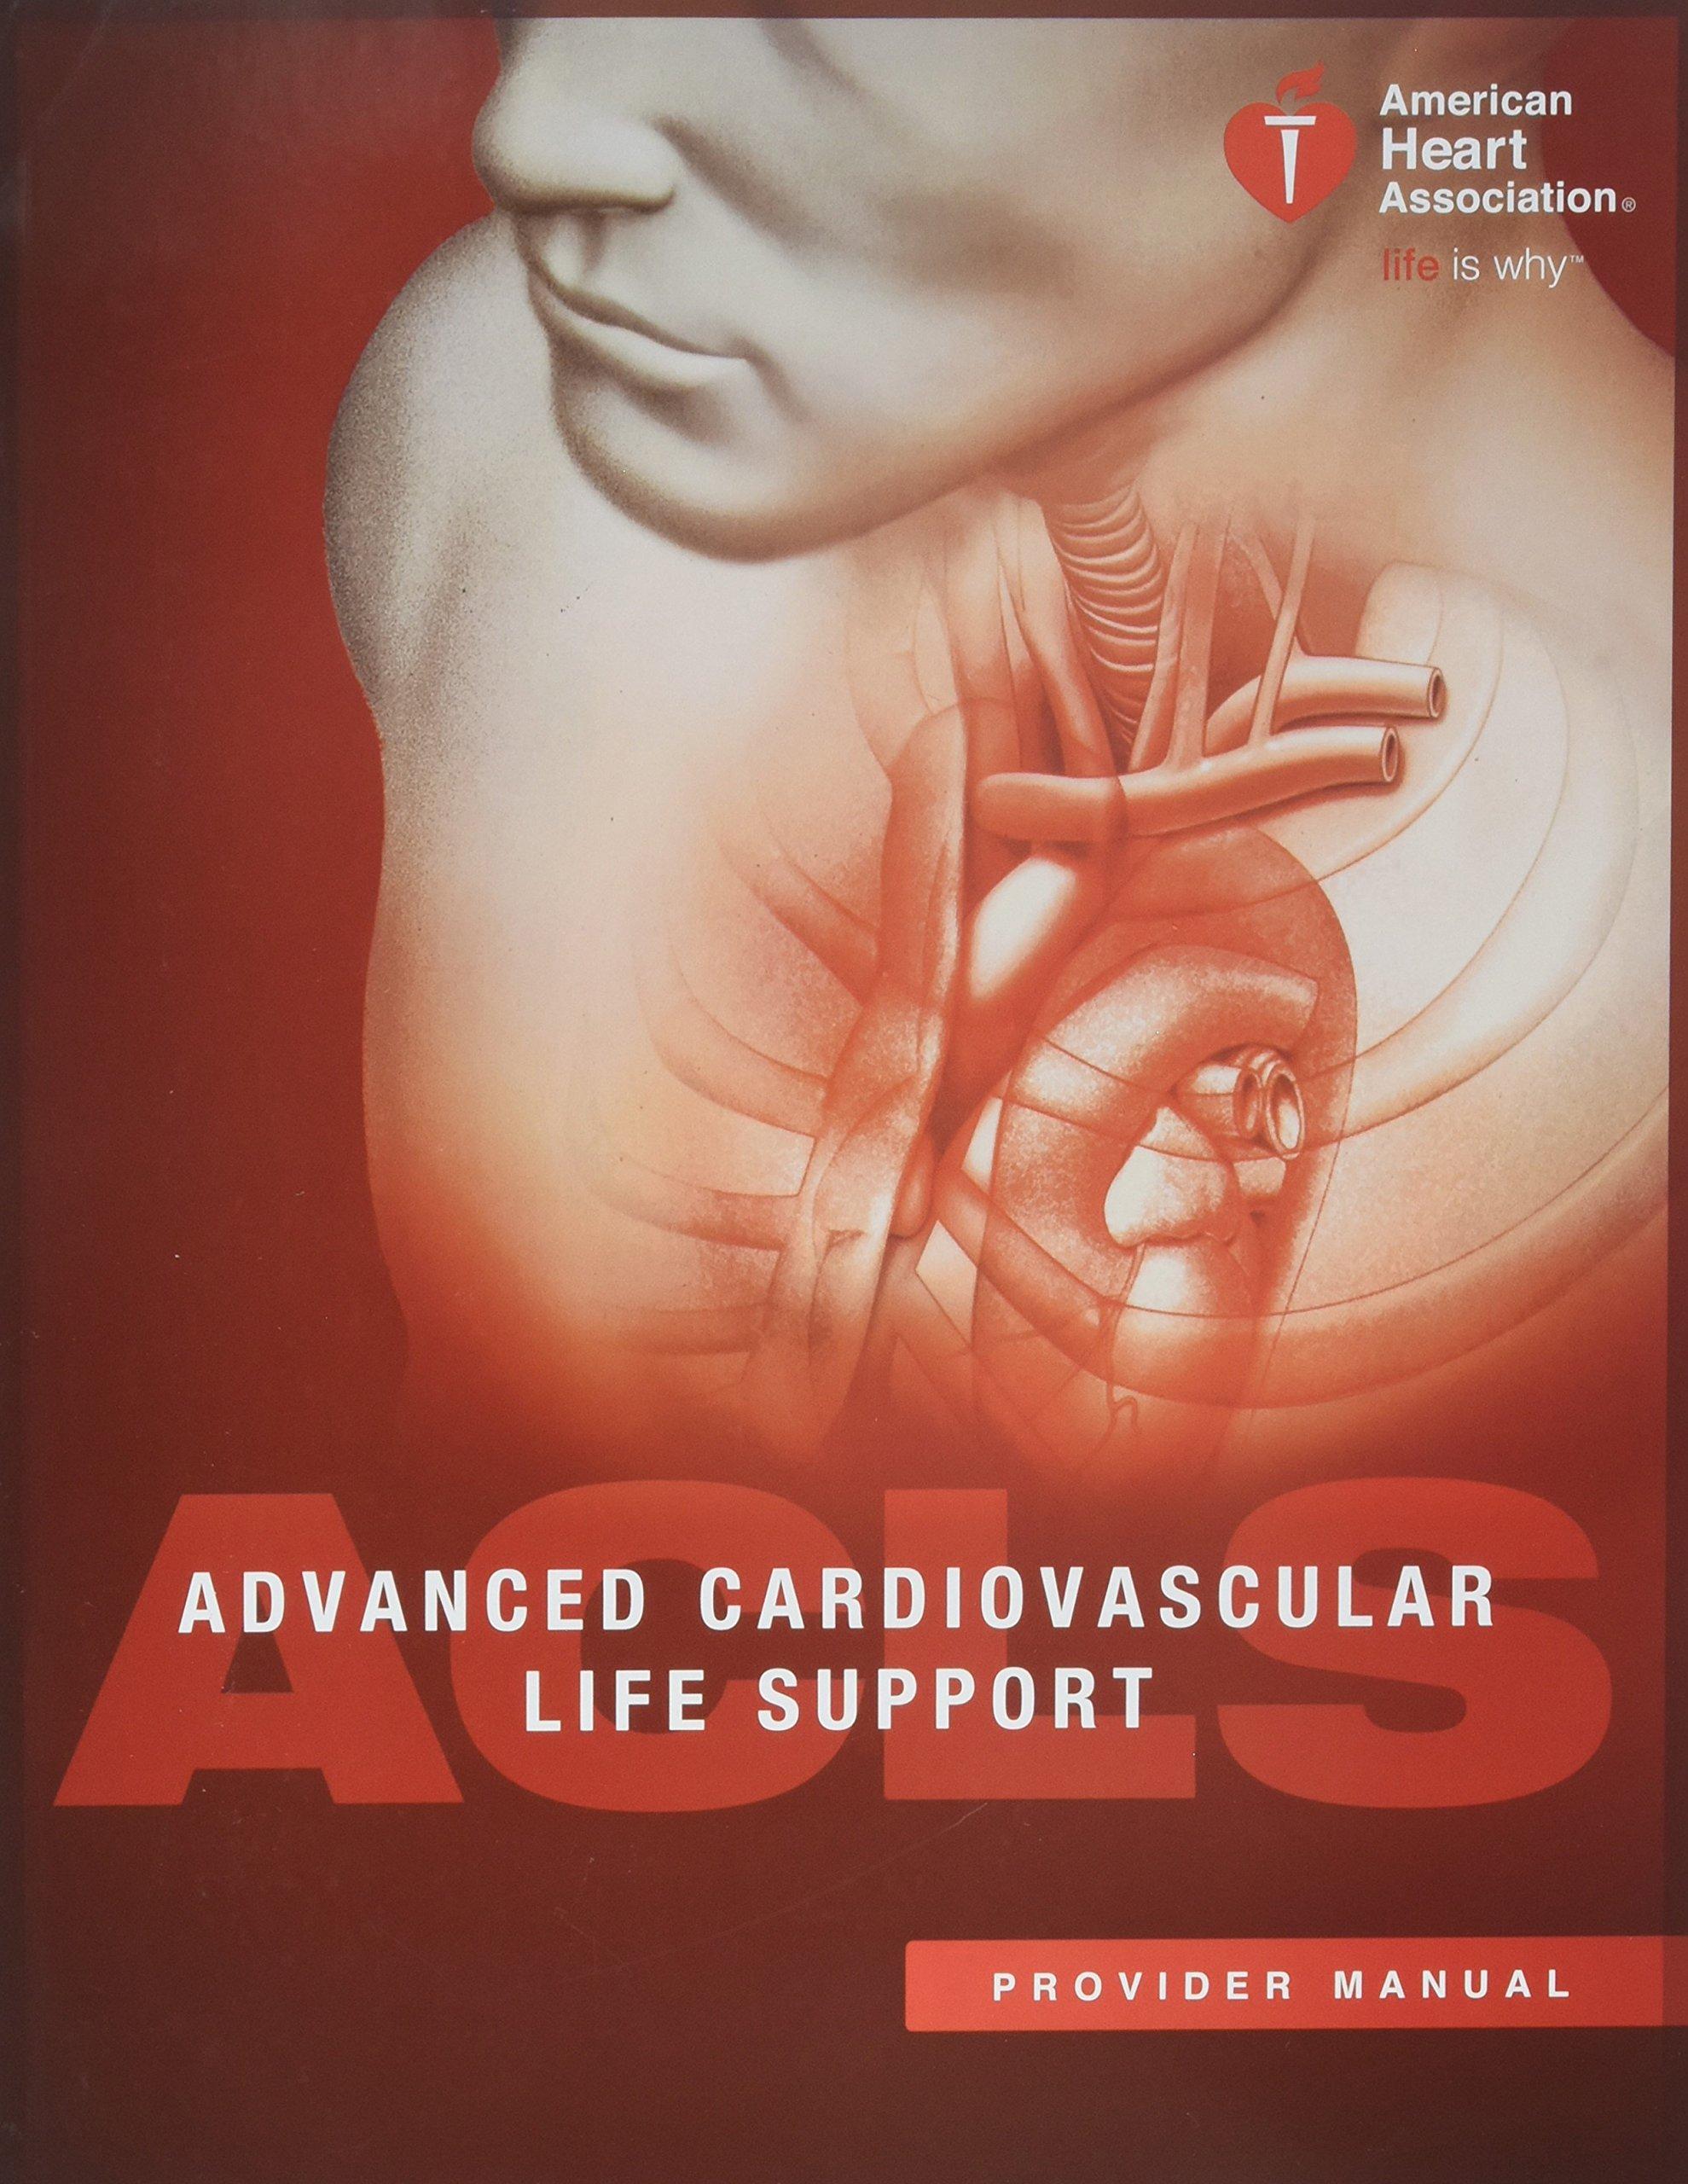 Acls Provider Manual 2020 Pdf Free